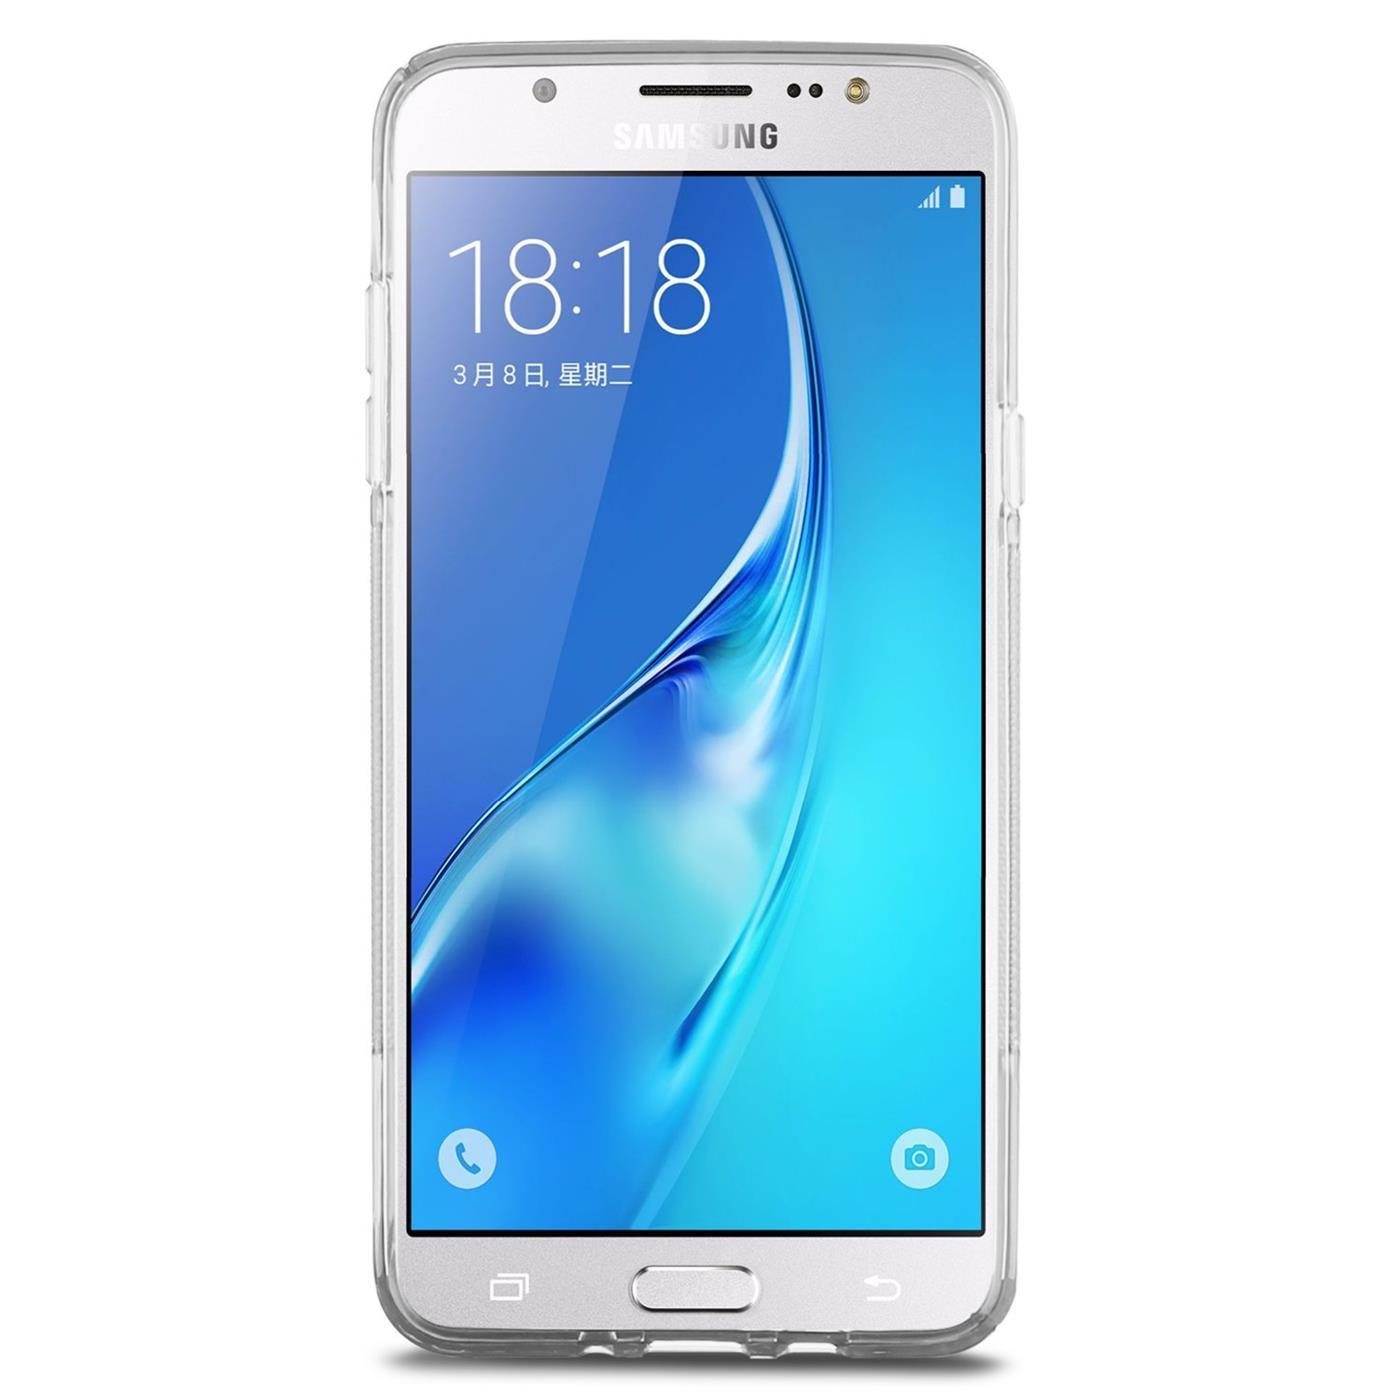 Samsung-Galaxy-j7-2016-Silikon-Gel-S-Line-Case-Cover-Duenn-Slim-Back-Bumper Indexbild 24